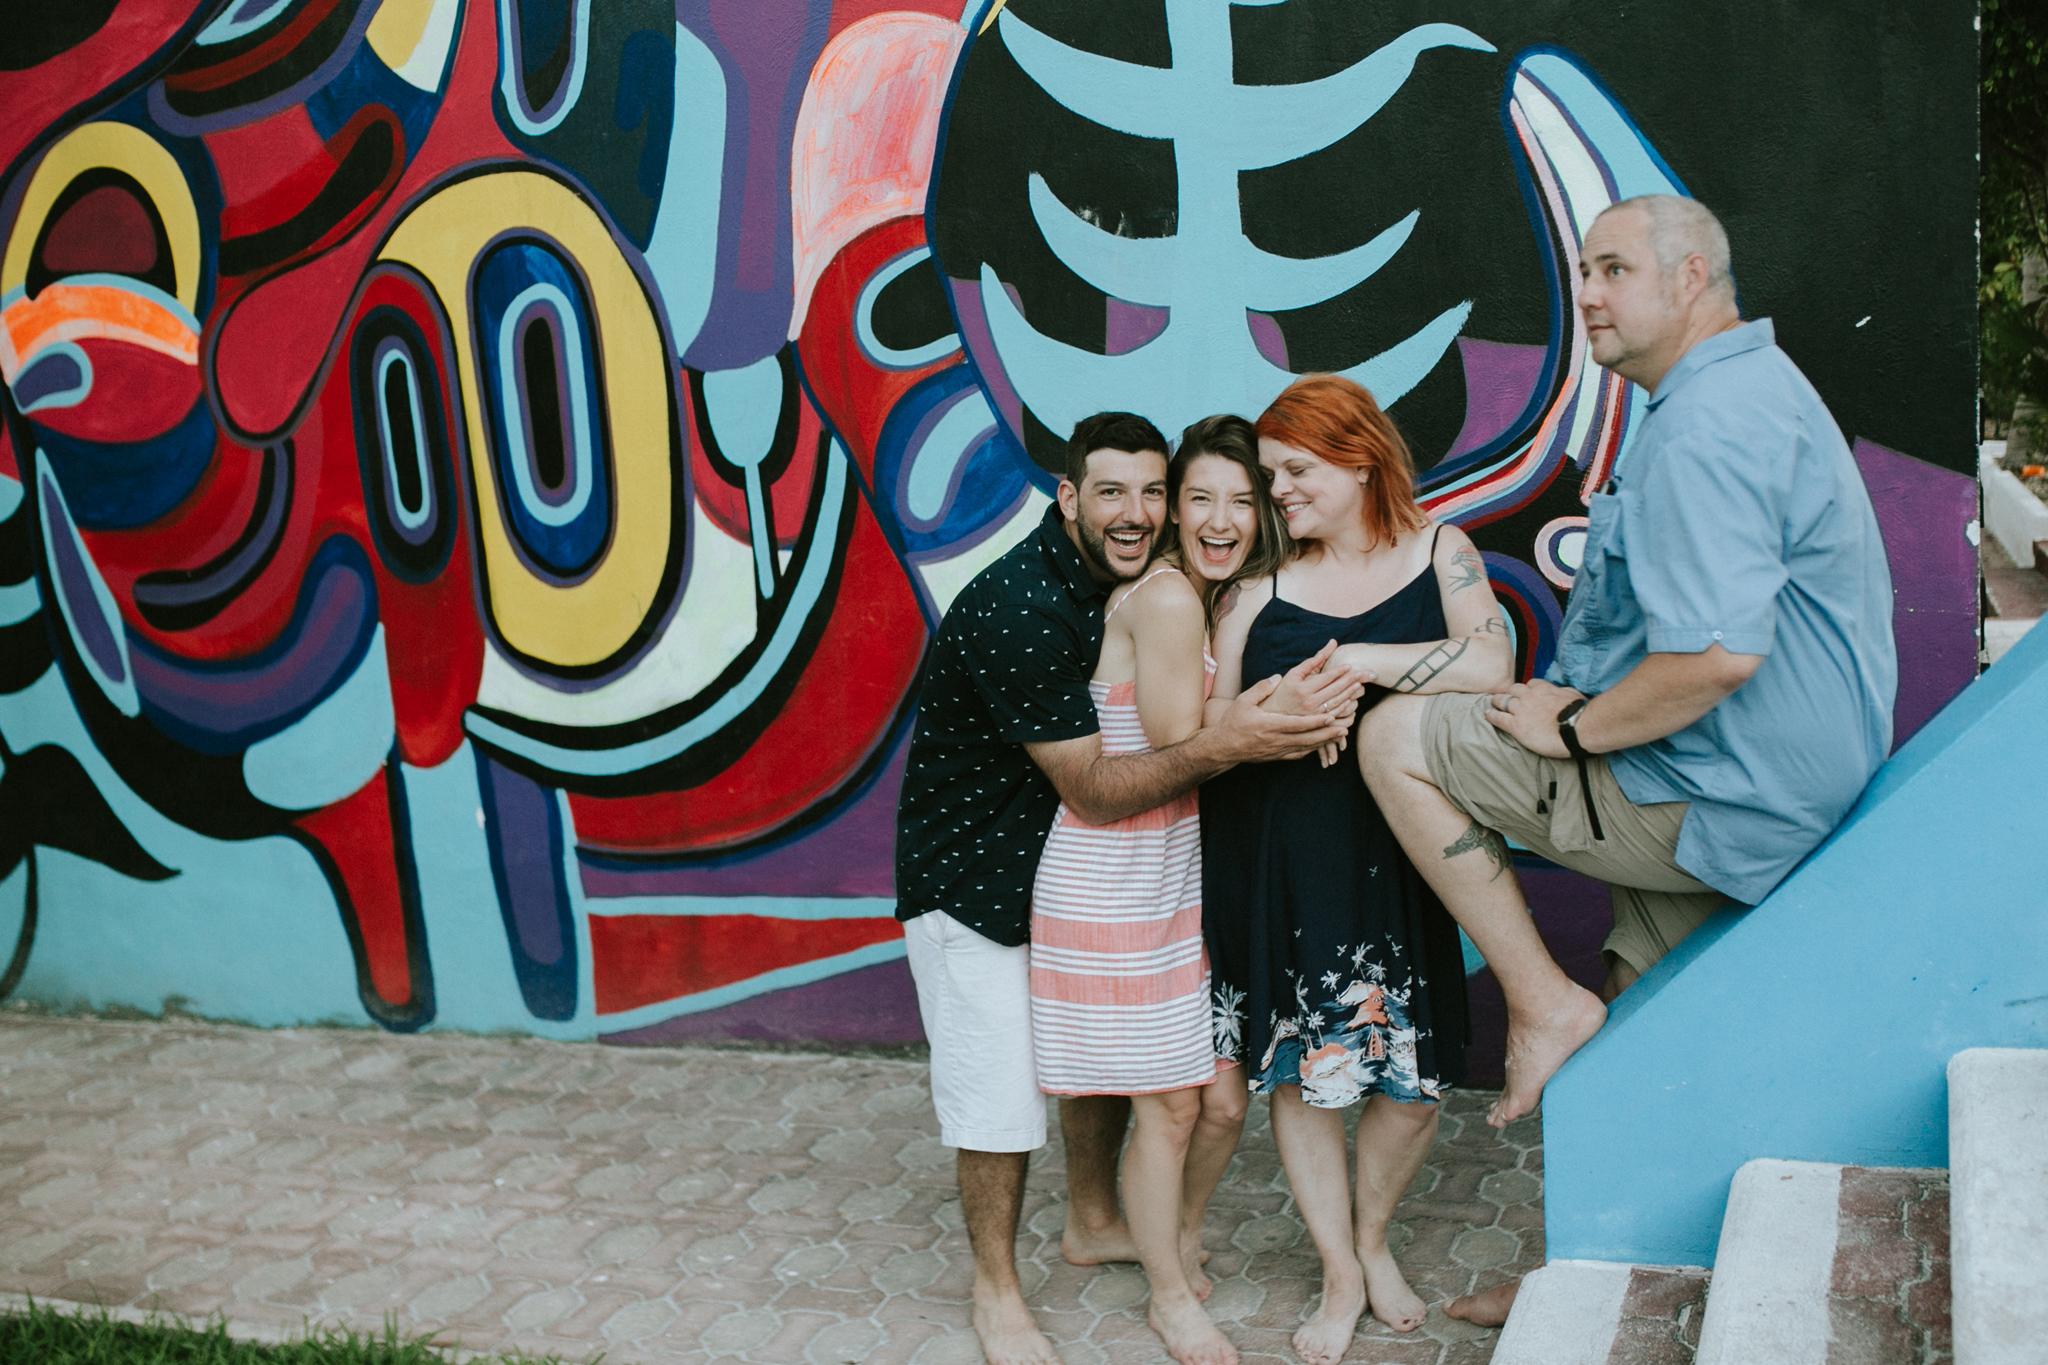 cancun-07-13-2019-family-trip-38_original.jpg